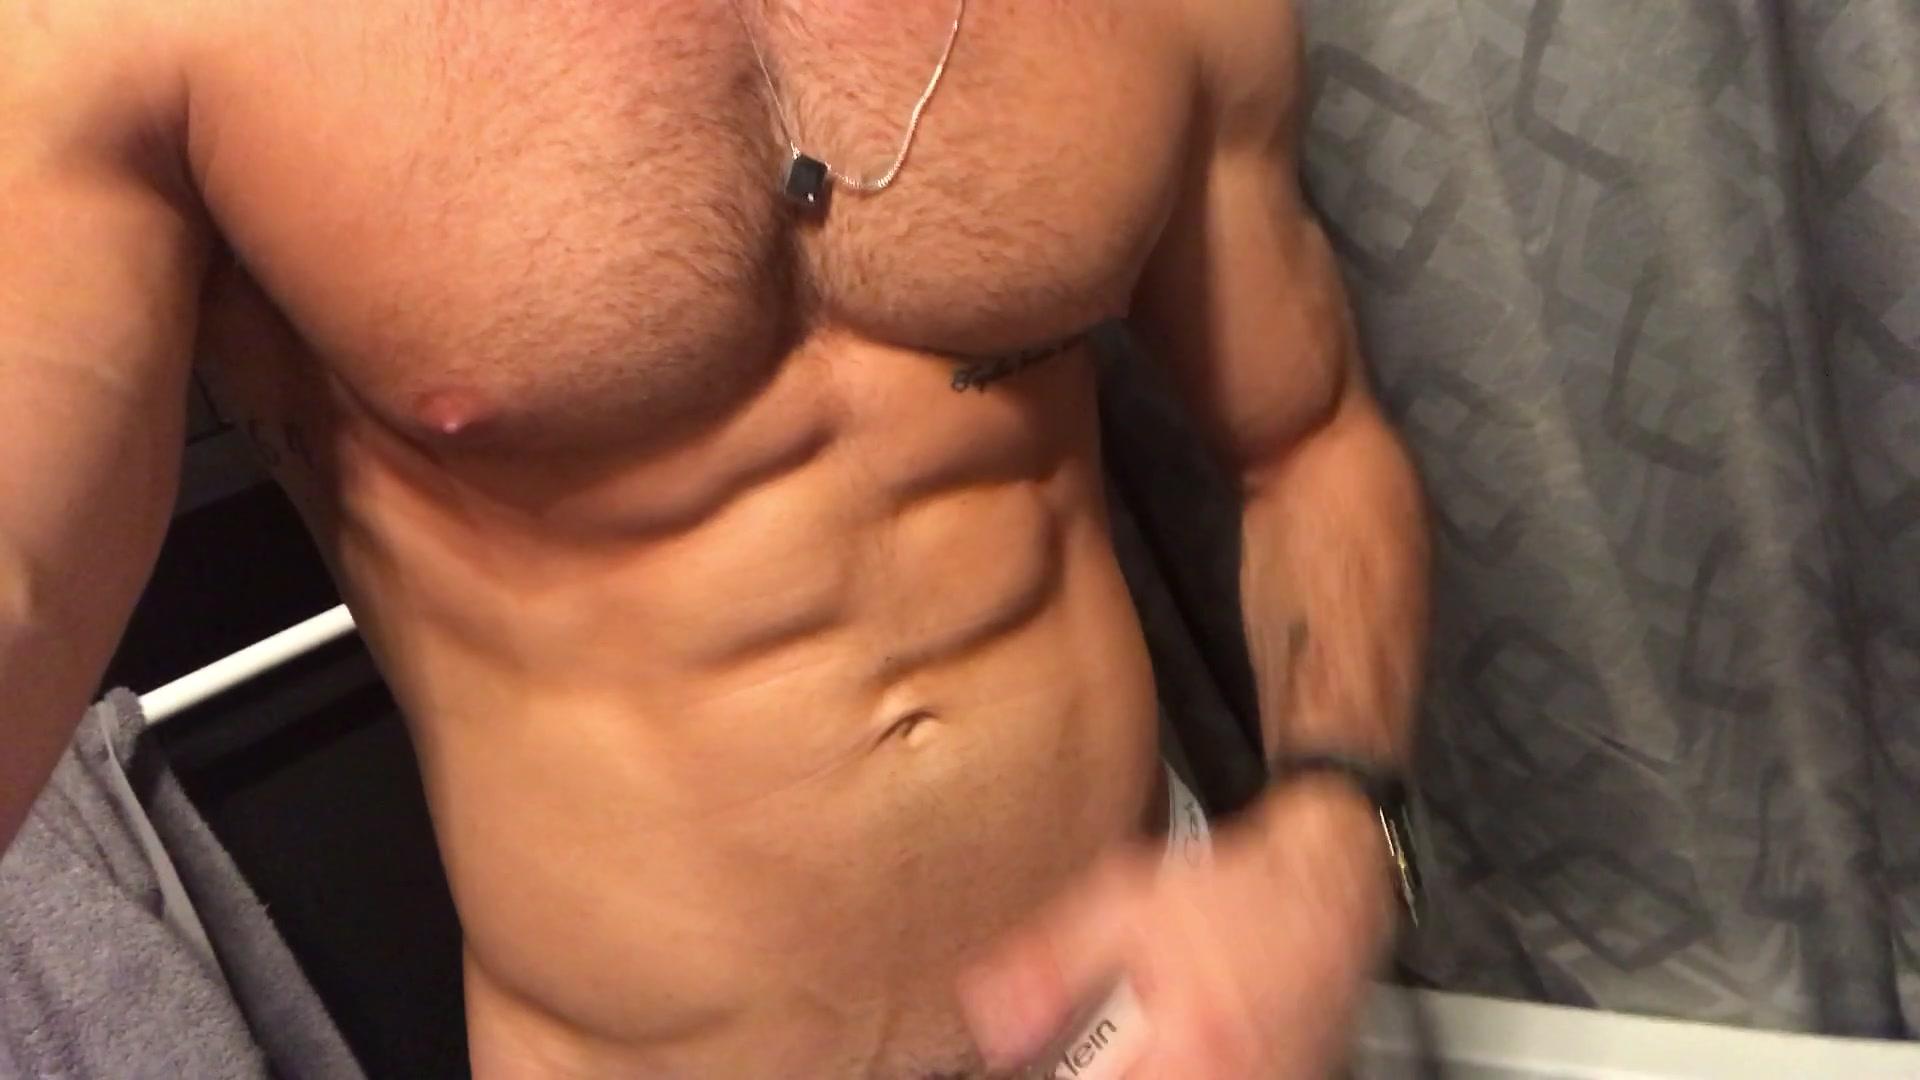 Anthony Pecoraro Porn anthony pecoraro (66)